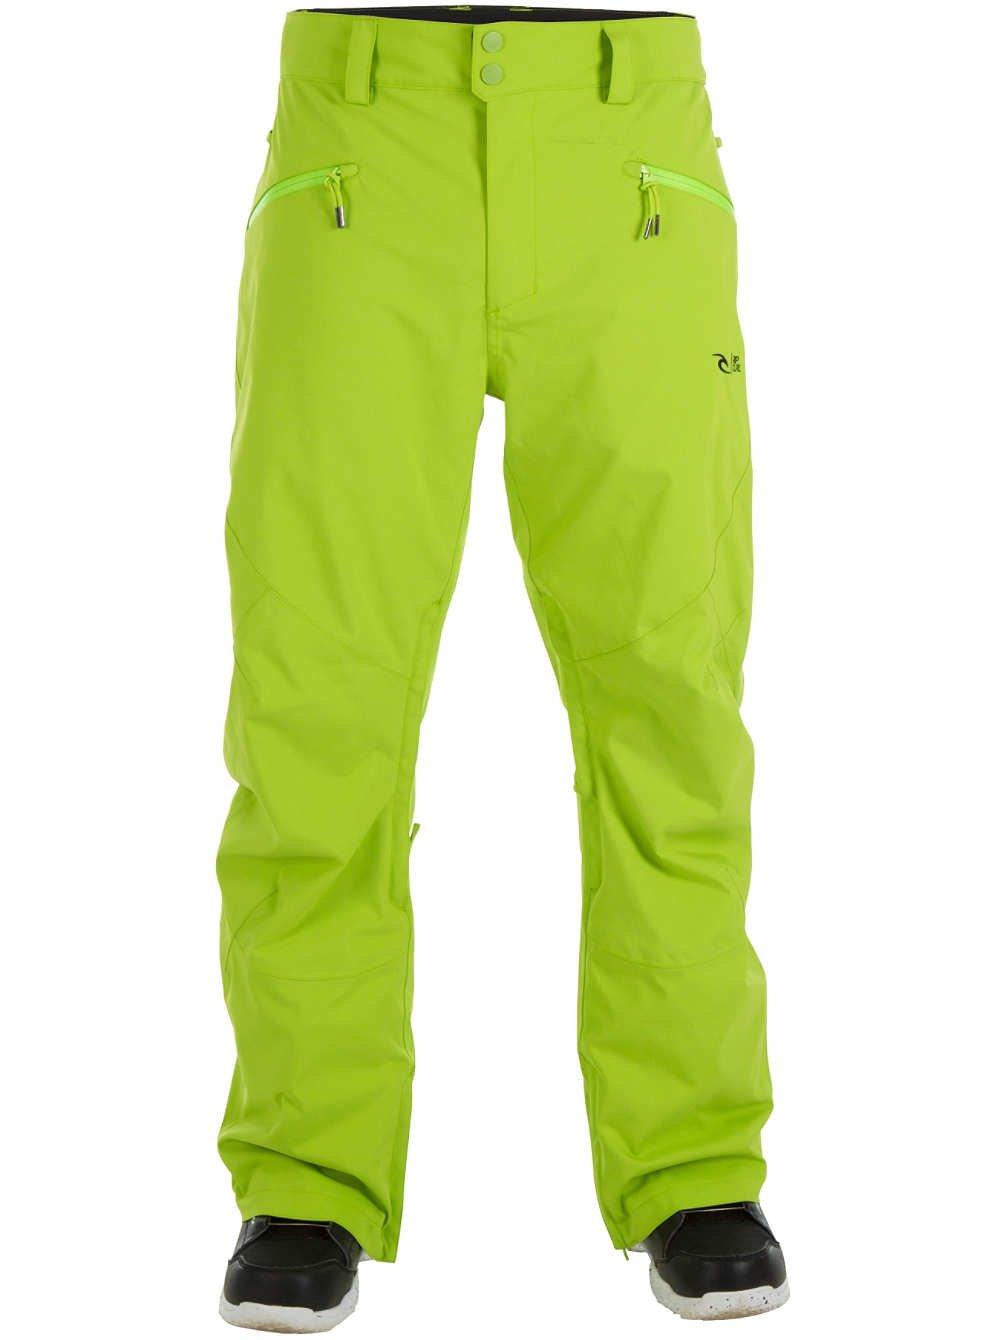 Herren Snowboard Hose Rip Curl Core Search Gum Pants online bestellen